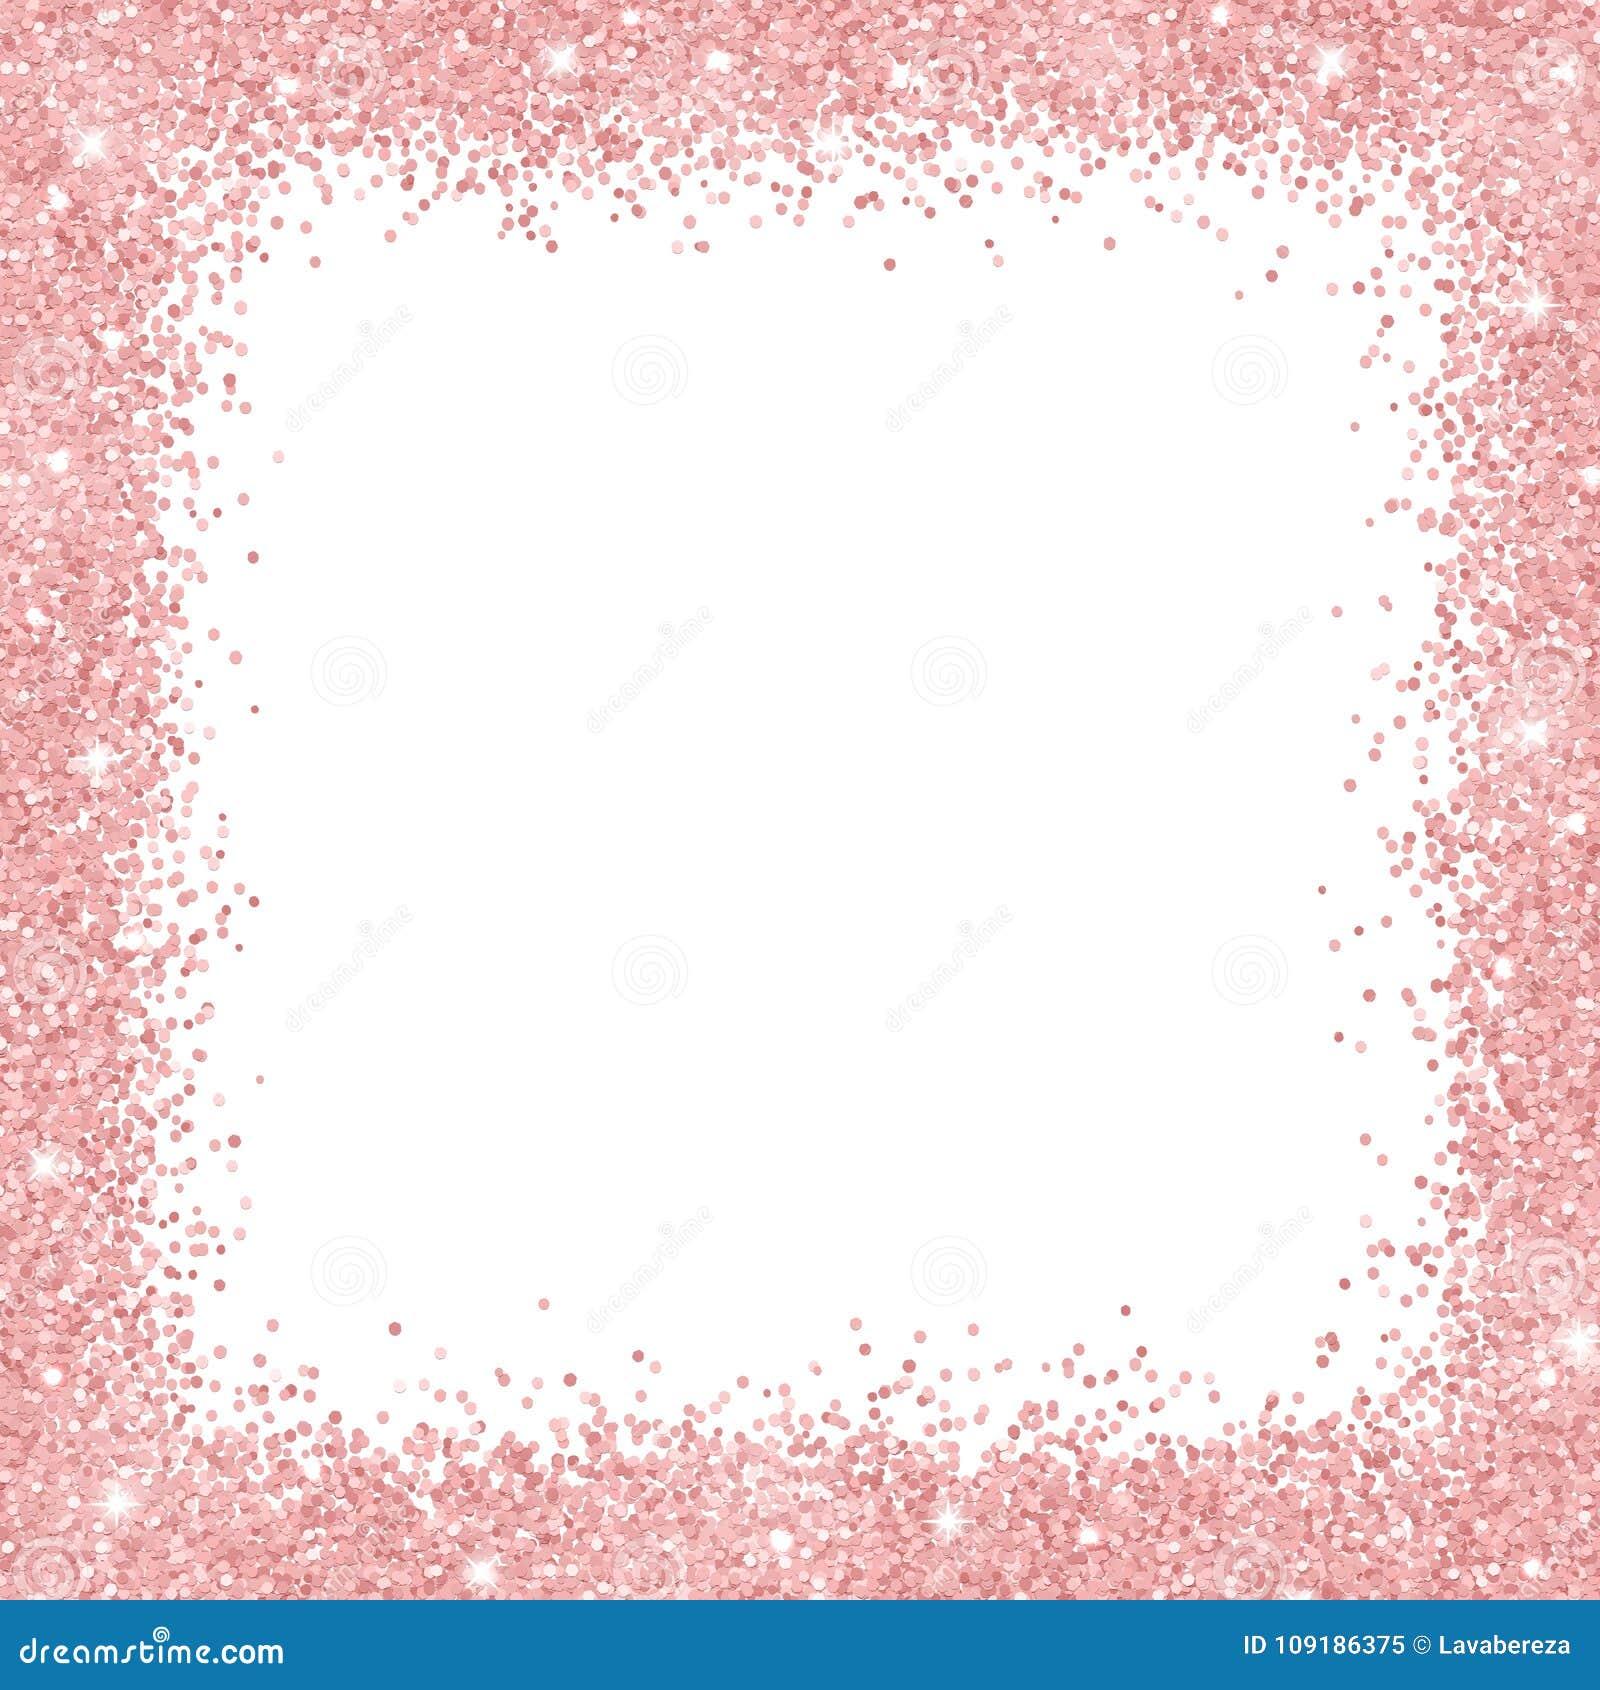 Border Frame With Rose Gold Glitter On White Background Vector